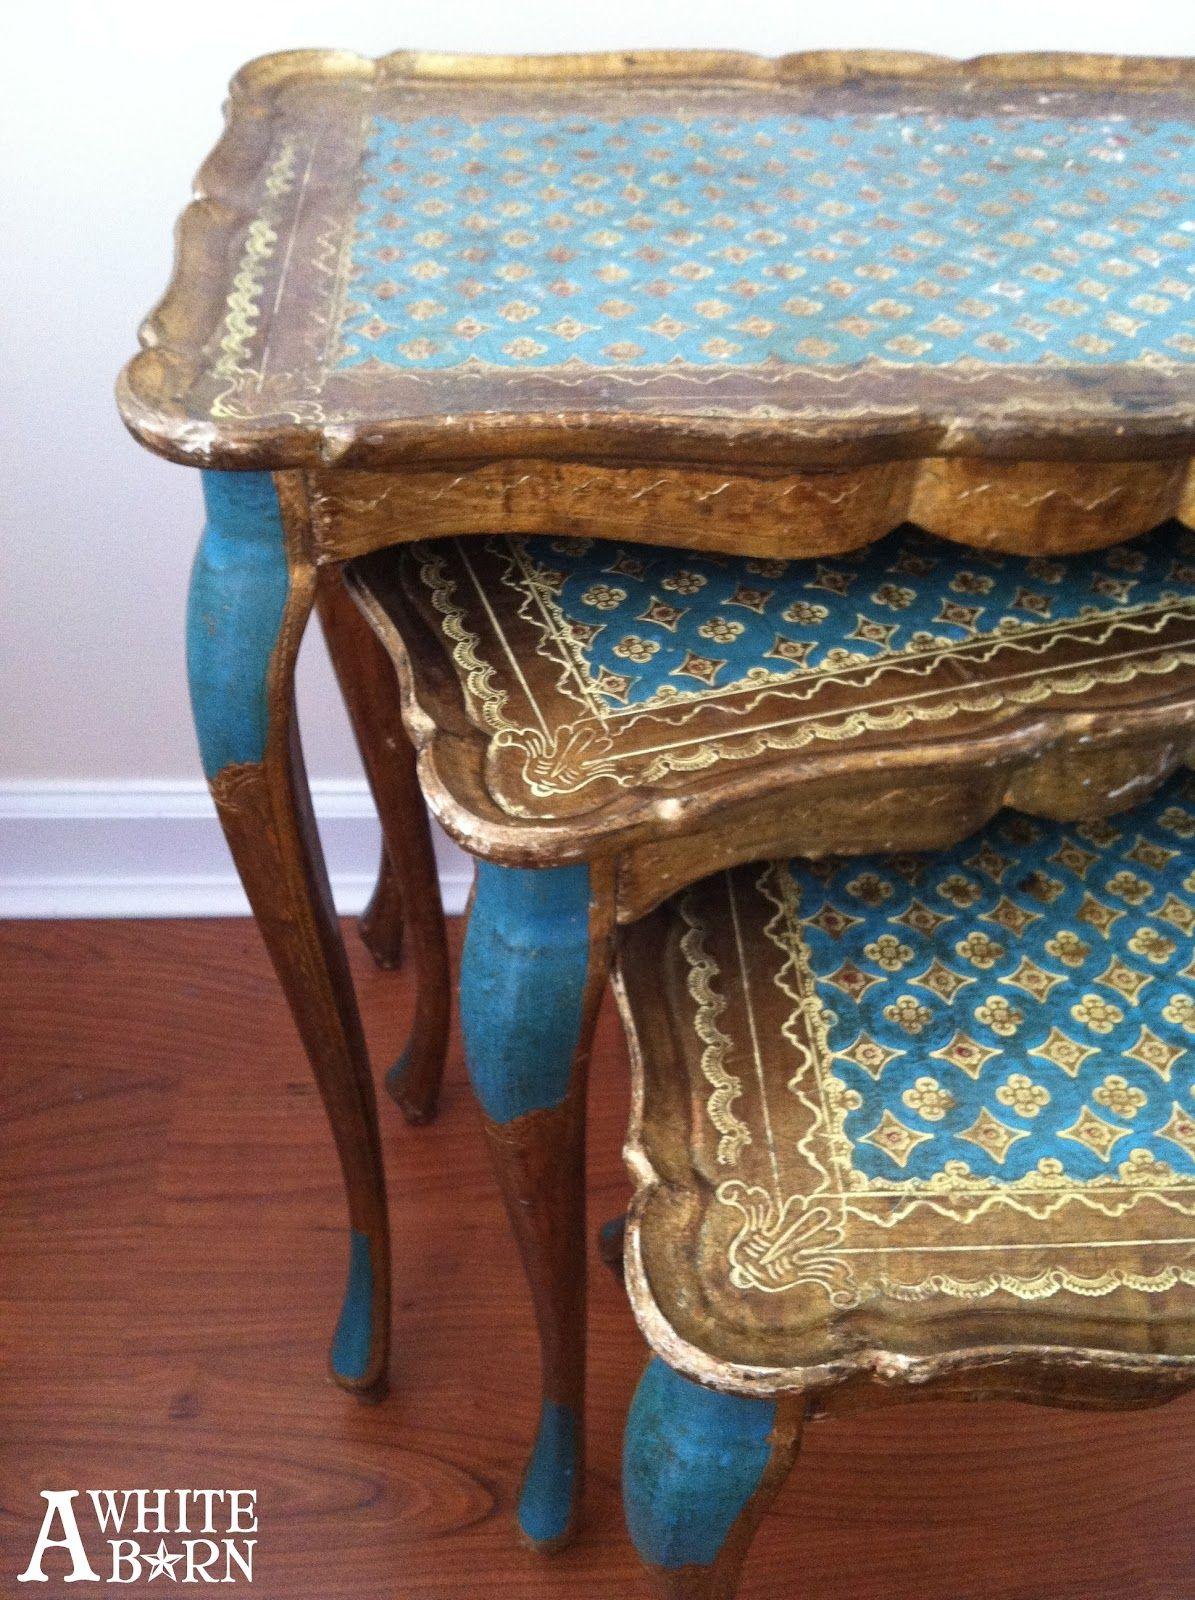 Florentine Nesting Tables Mobilya Yenileme Boyanmis Mobilya Mobilya Boyama